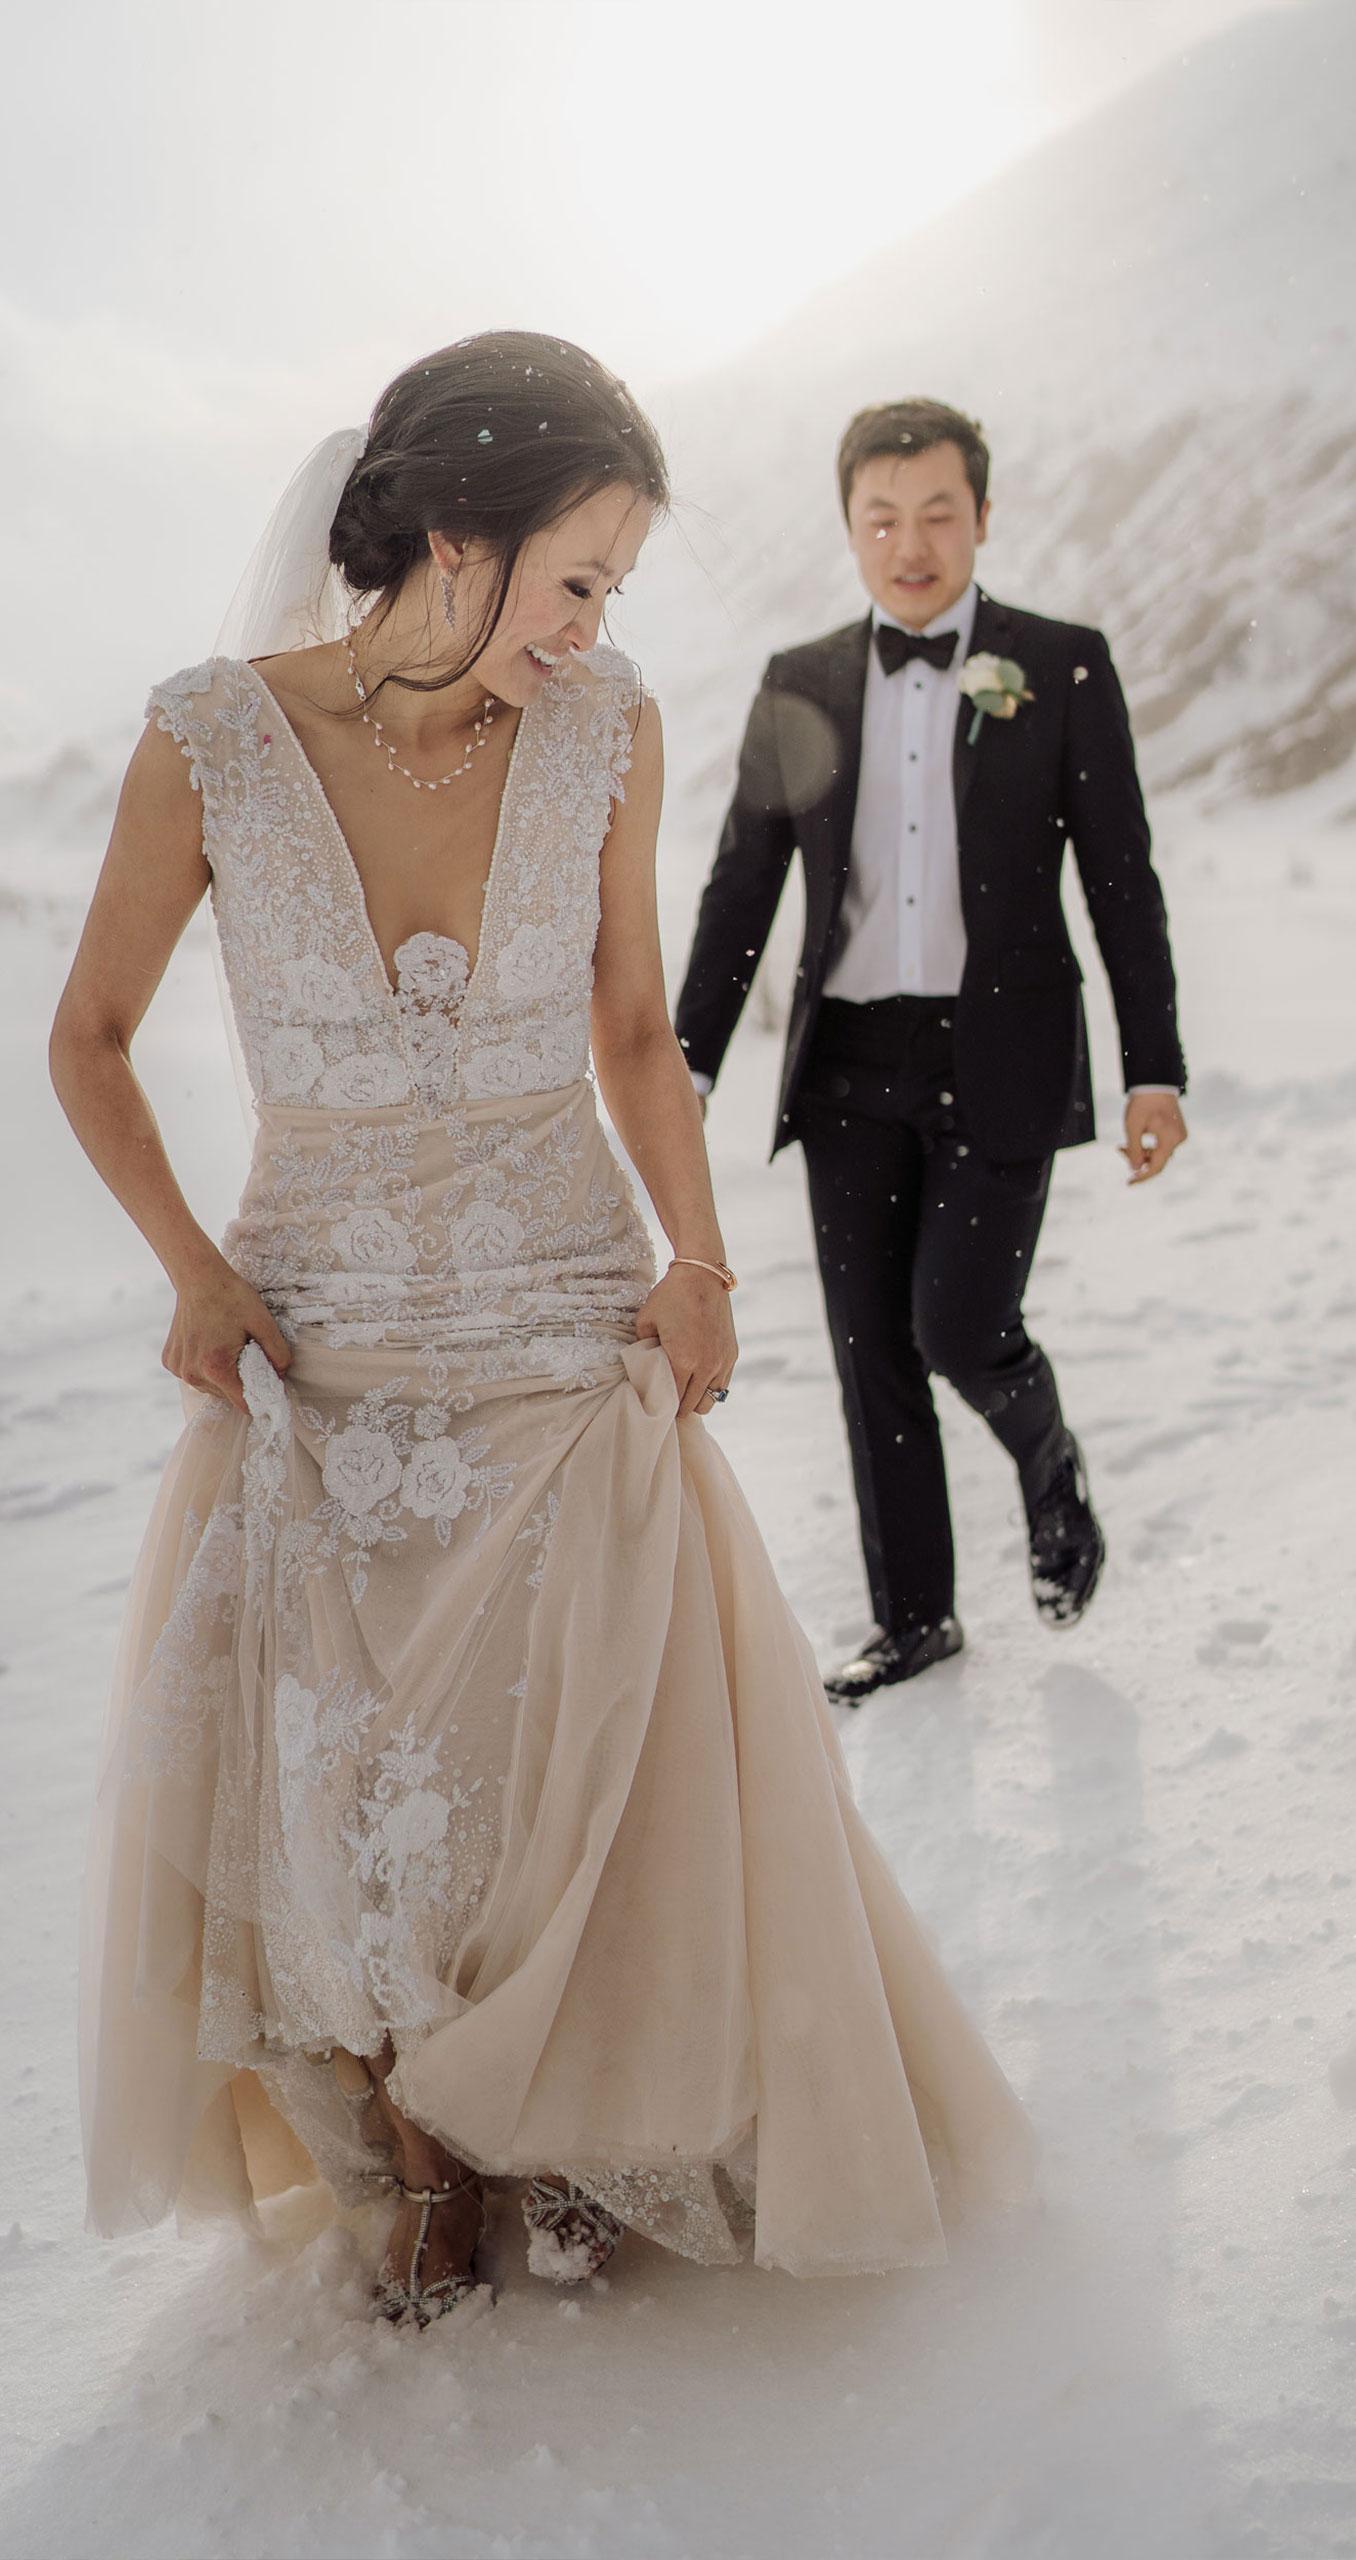 bridalhairandmakeup makeup artist andermat Switzerland destination Wedding